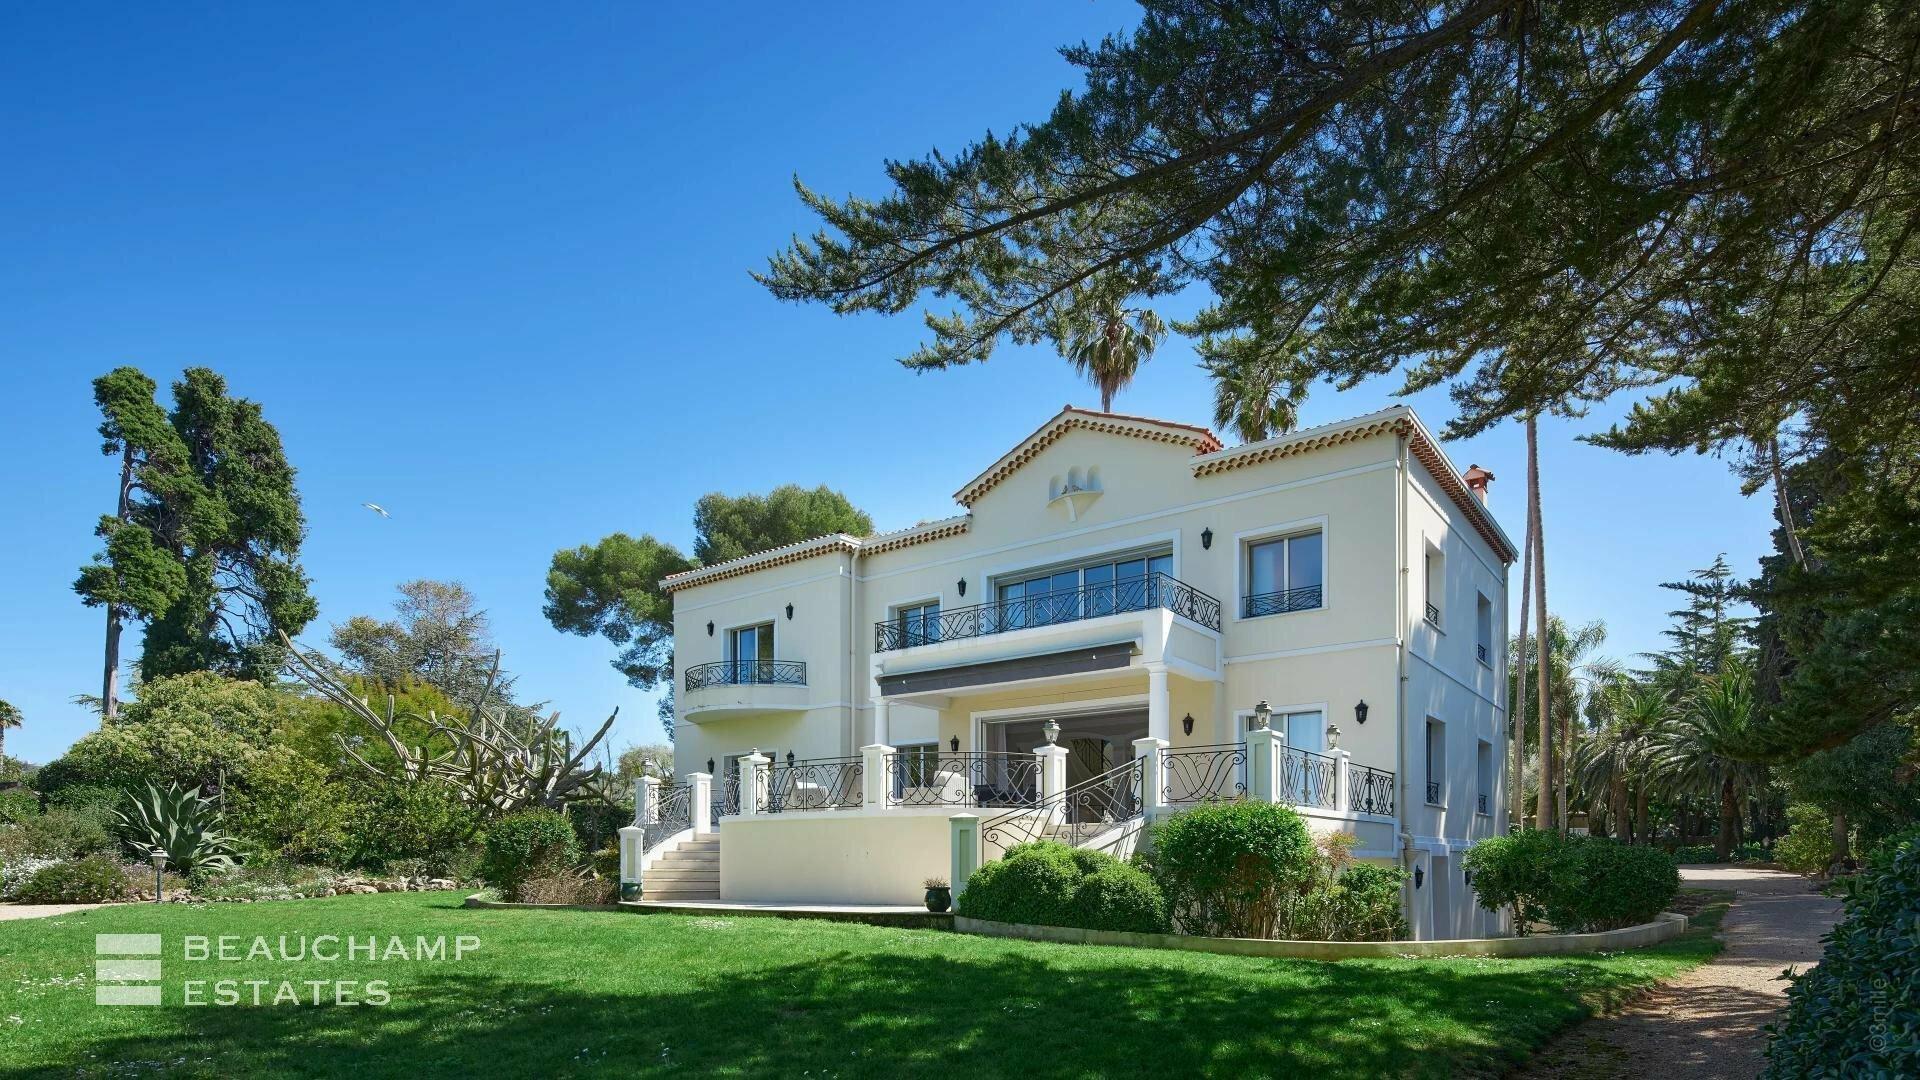 Villa in Antibes, Provence-Alpes-Côte d'Azur, France 1 - 11409760